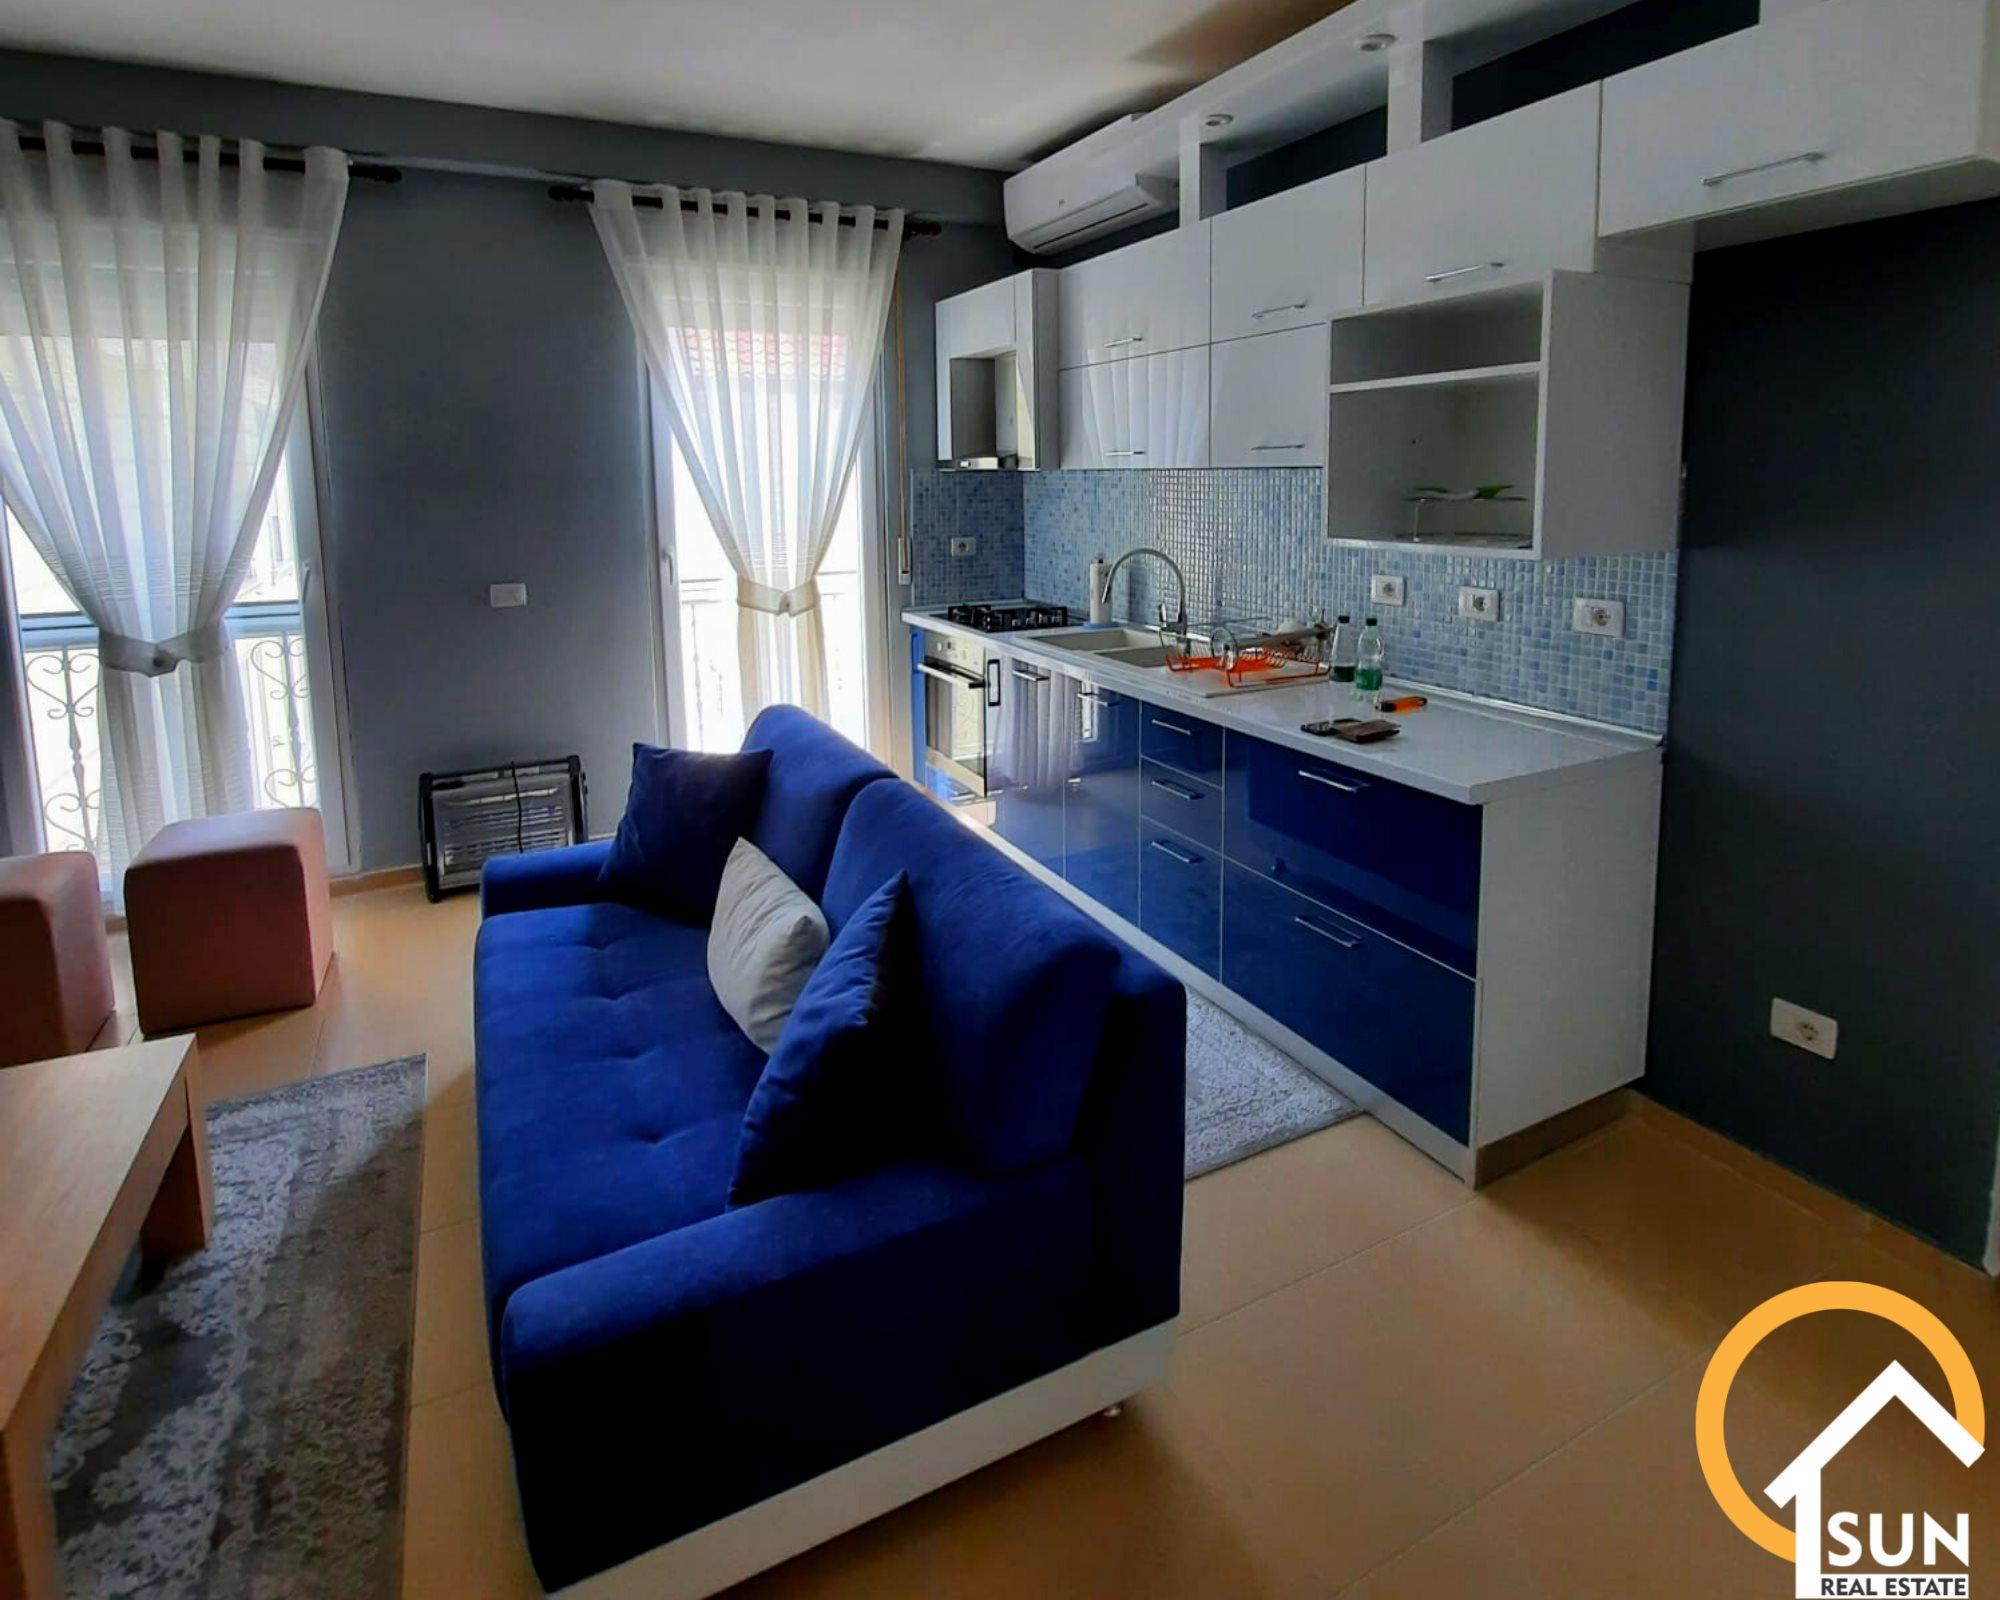 Apartament 1+1 pr shitje n shkoder